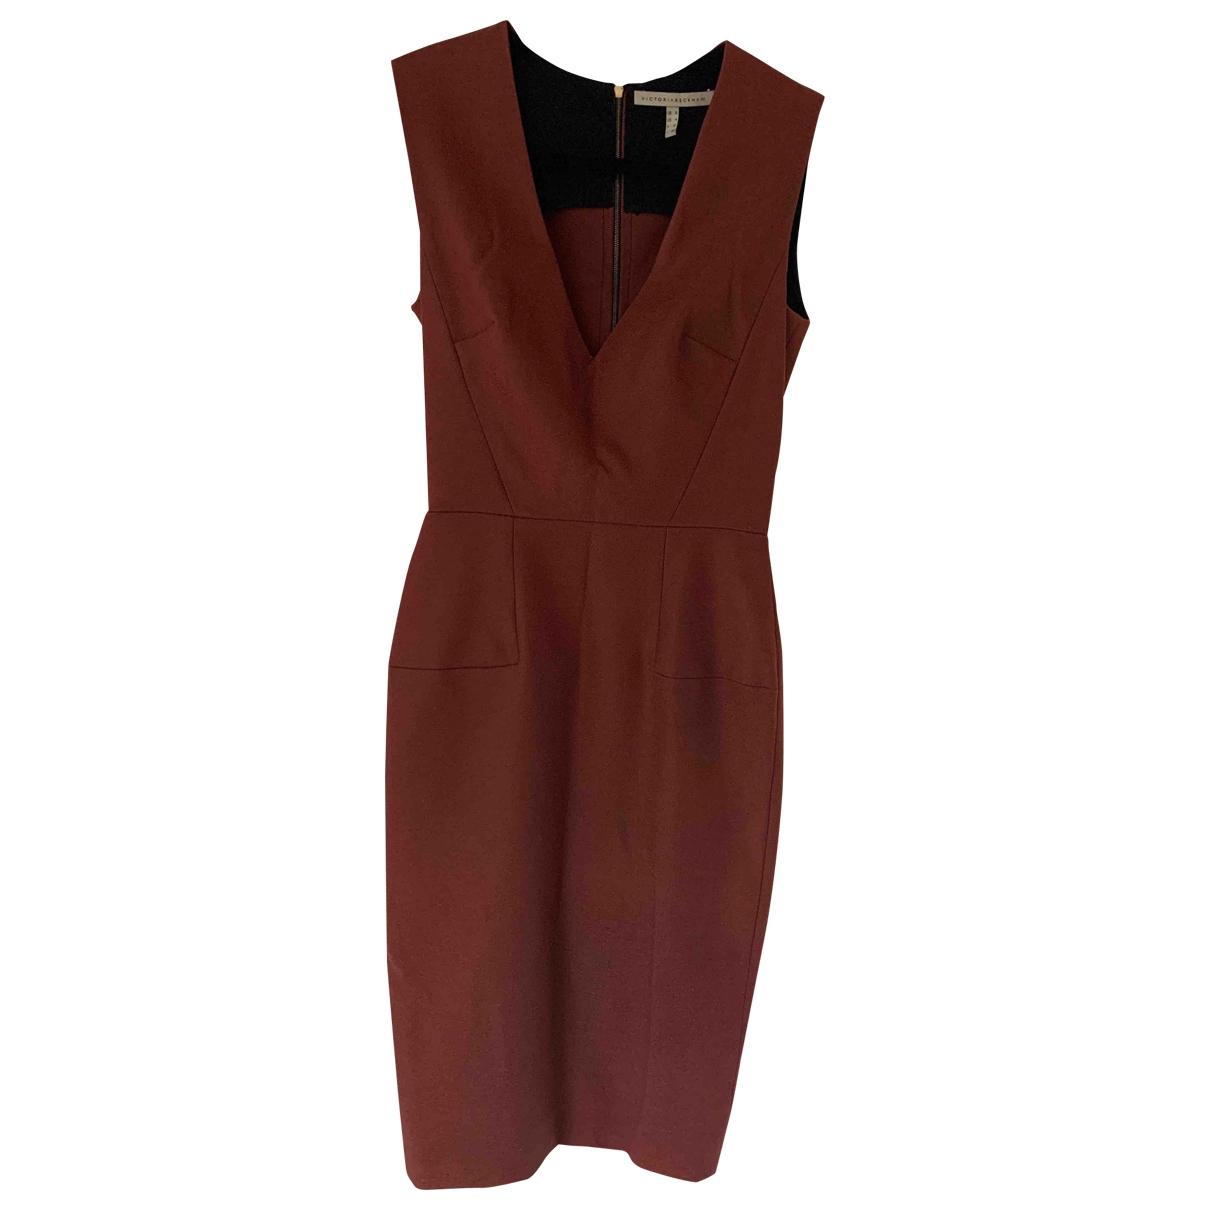 Victoria Beckham \N Cotton - elasthane dress for Women 36 FR